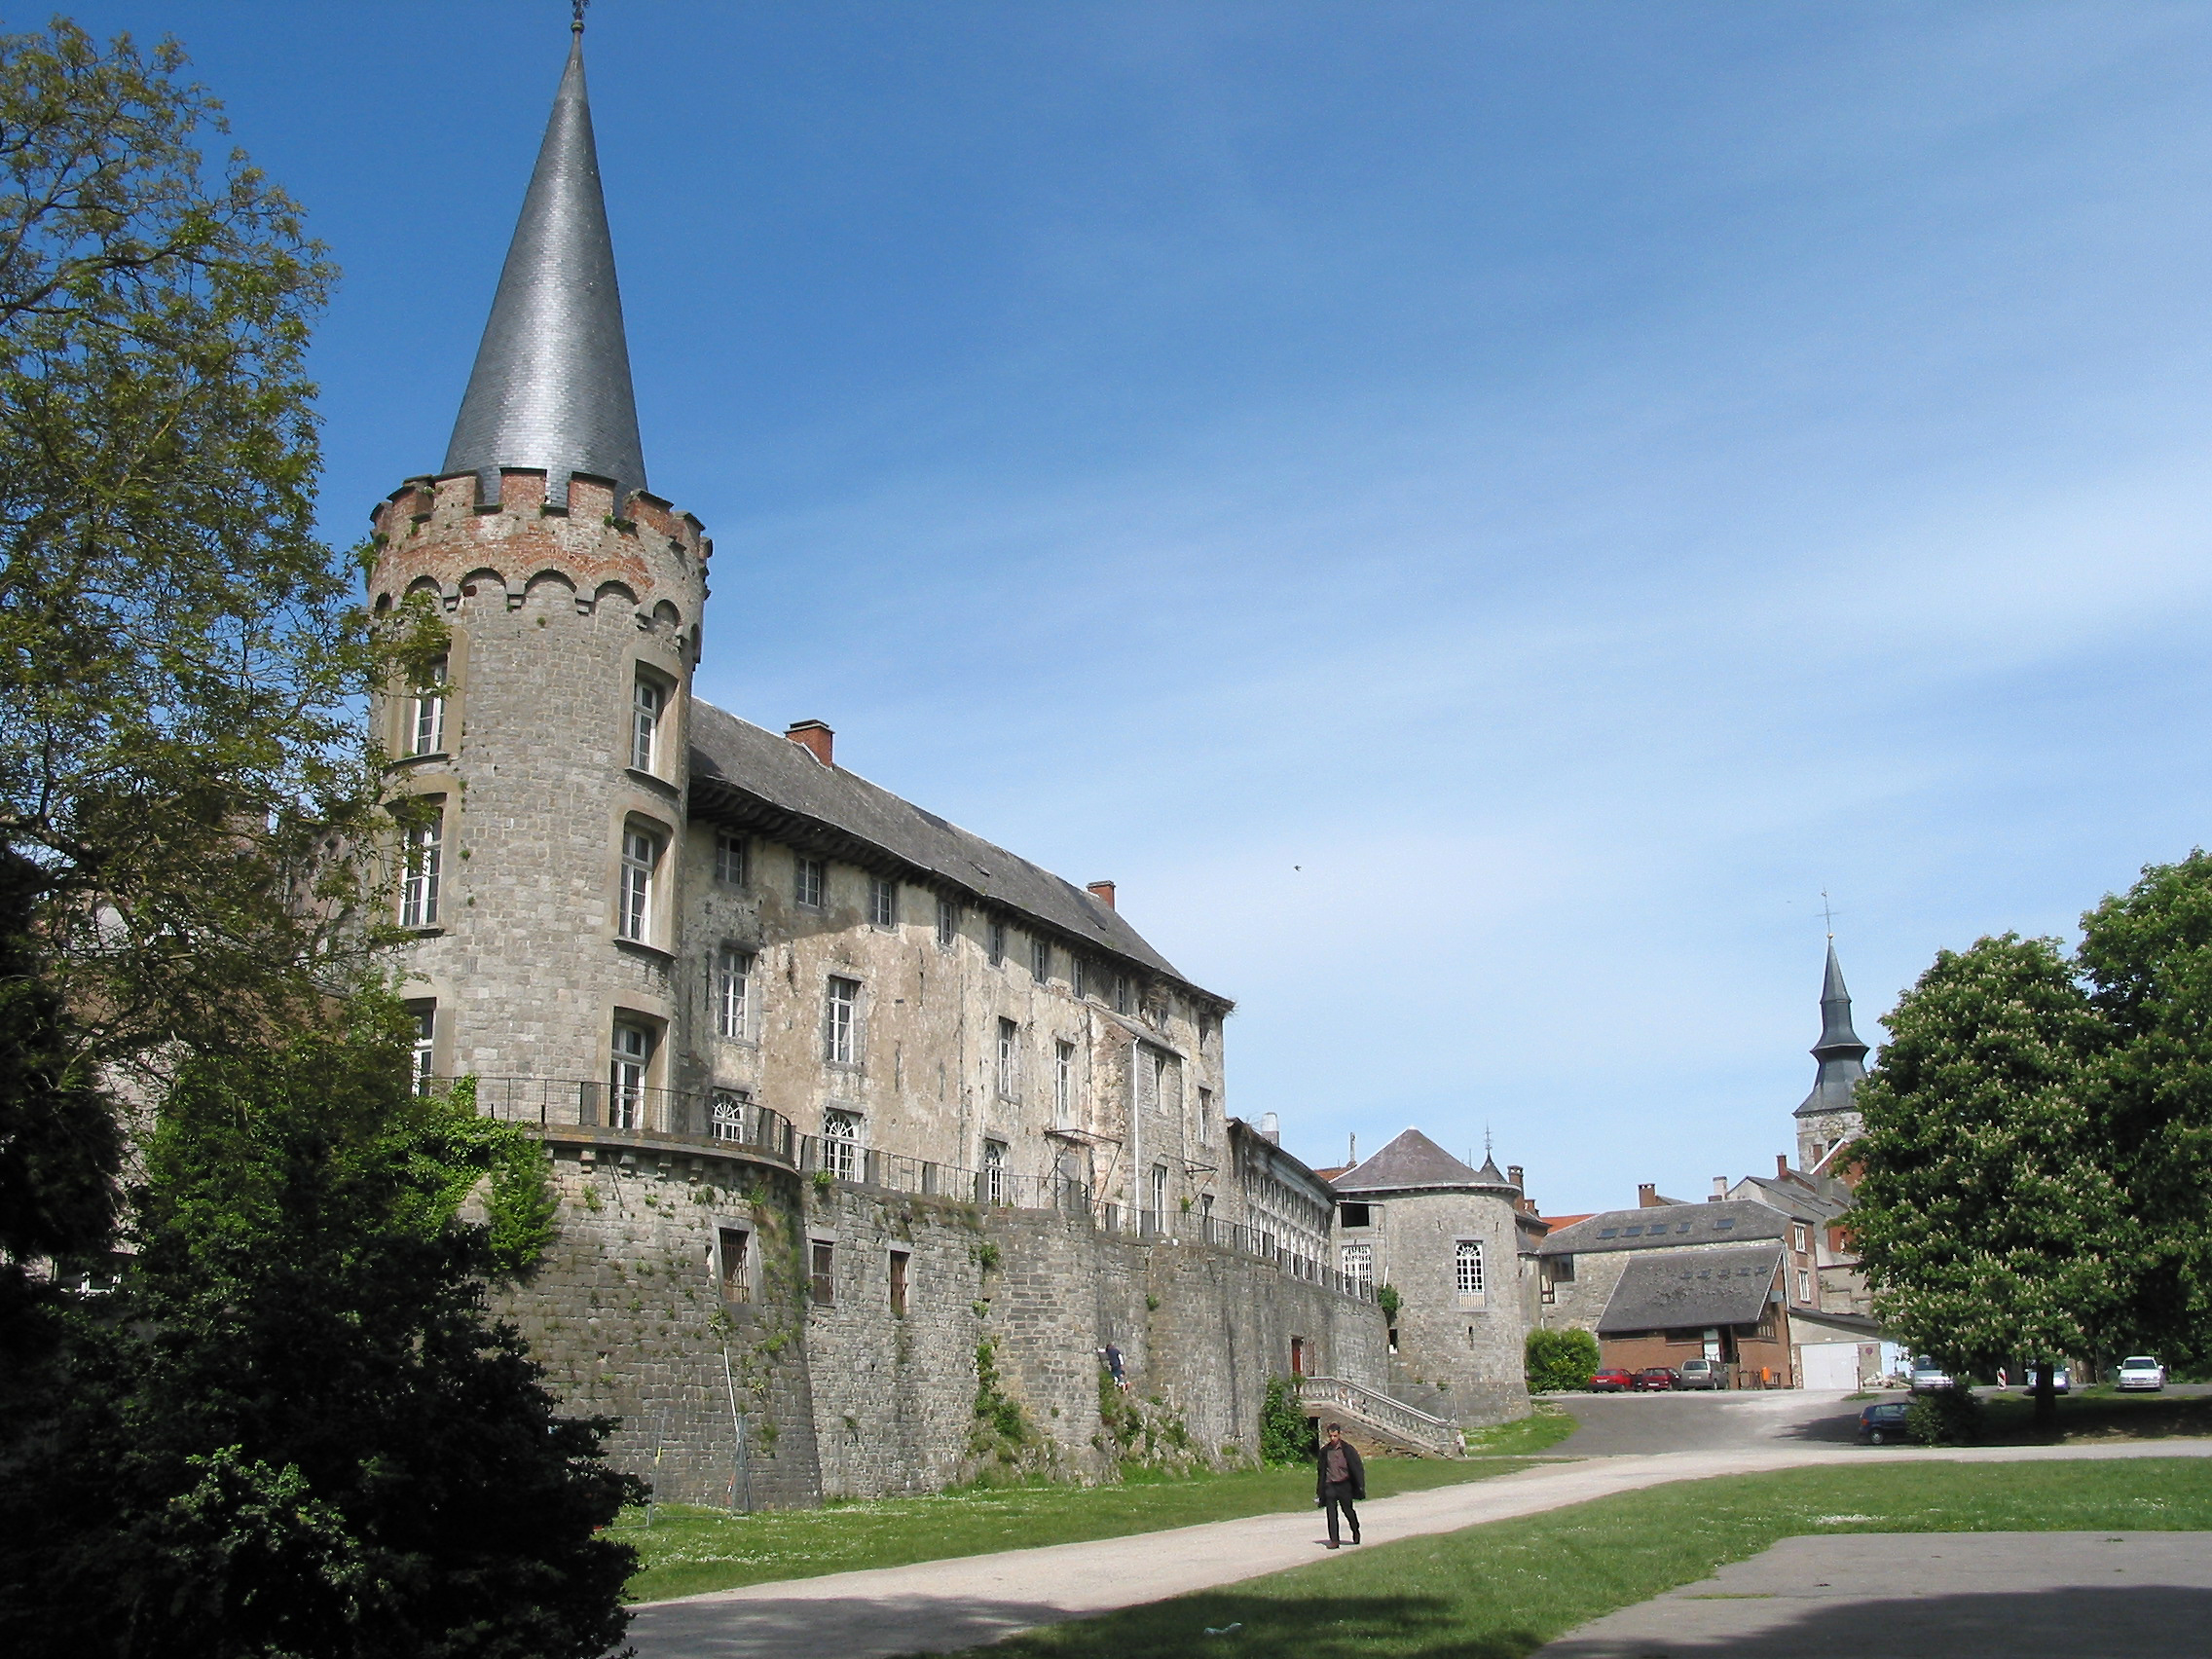 Château de Beaufort / de Florennes - Jean-Pol GRANDMONT Wikipedia